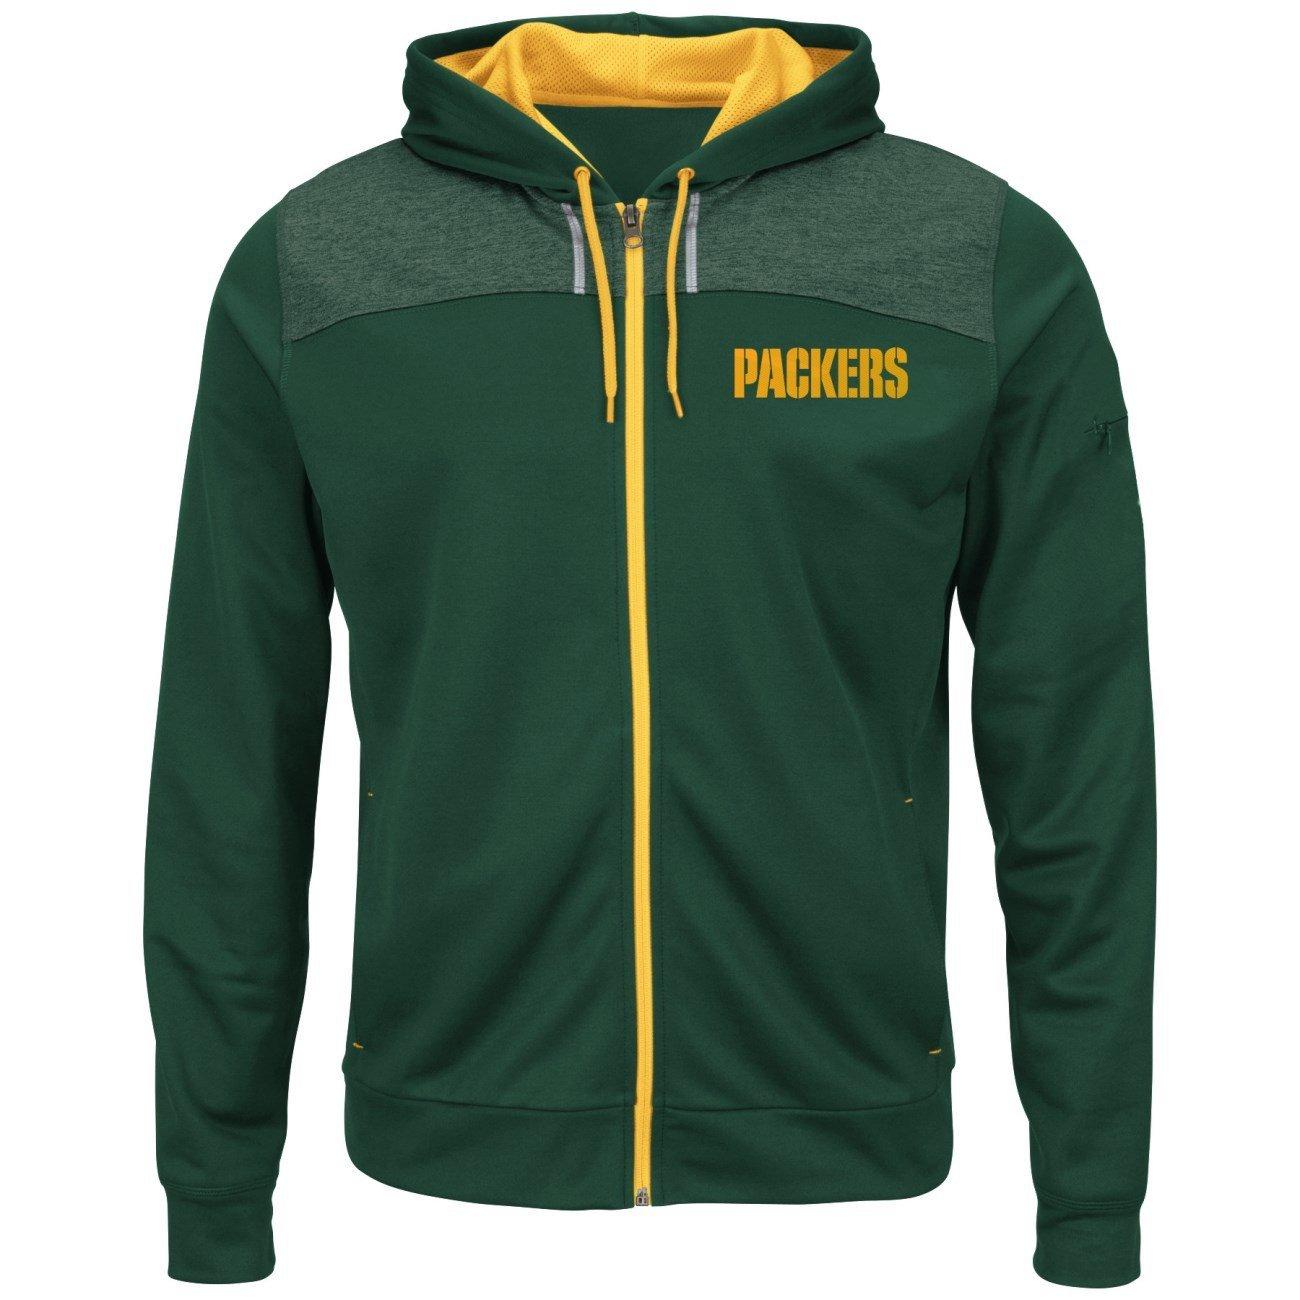 online retailer 386f6 4f1e5 Cheap Green Zip Hoodie, find Green Zip Hoodie deals on line ...